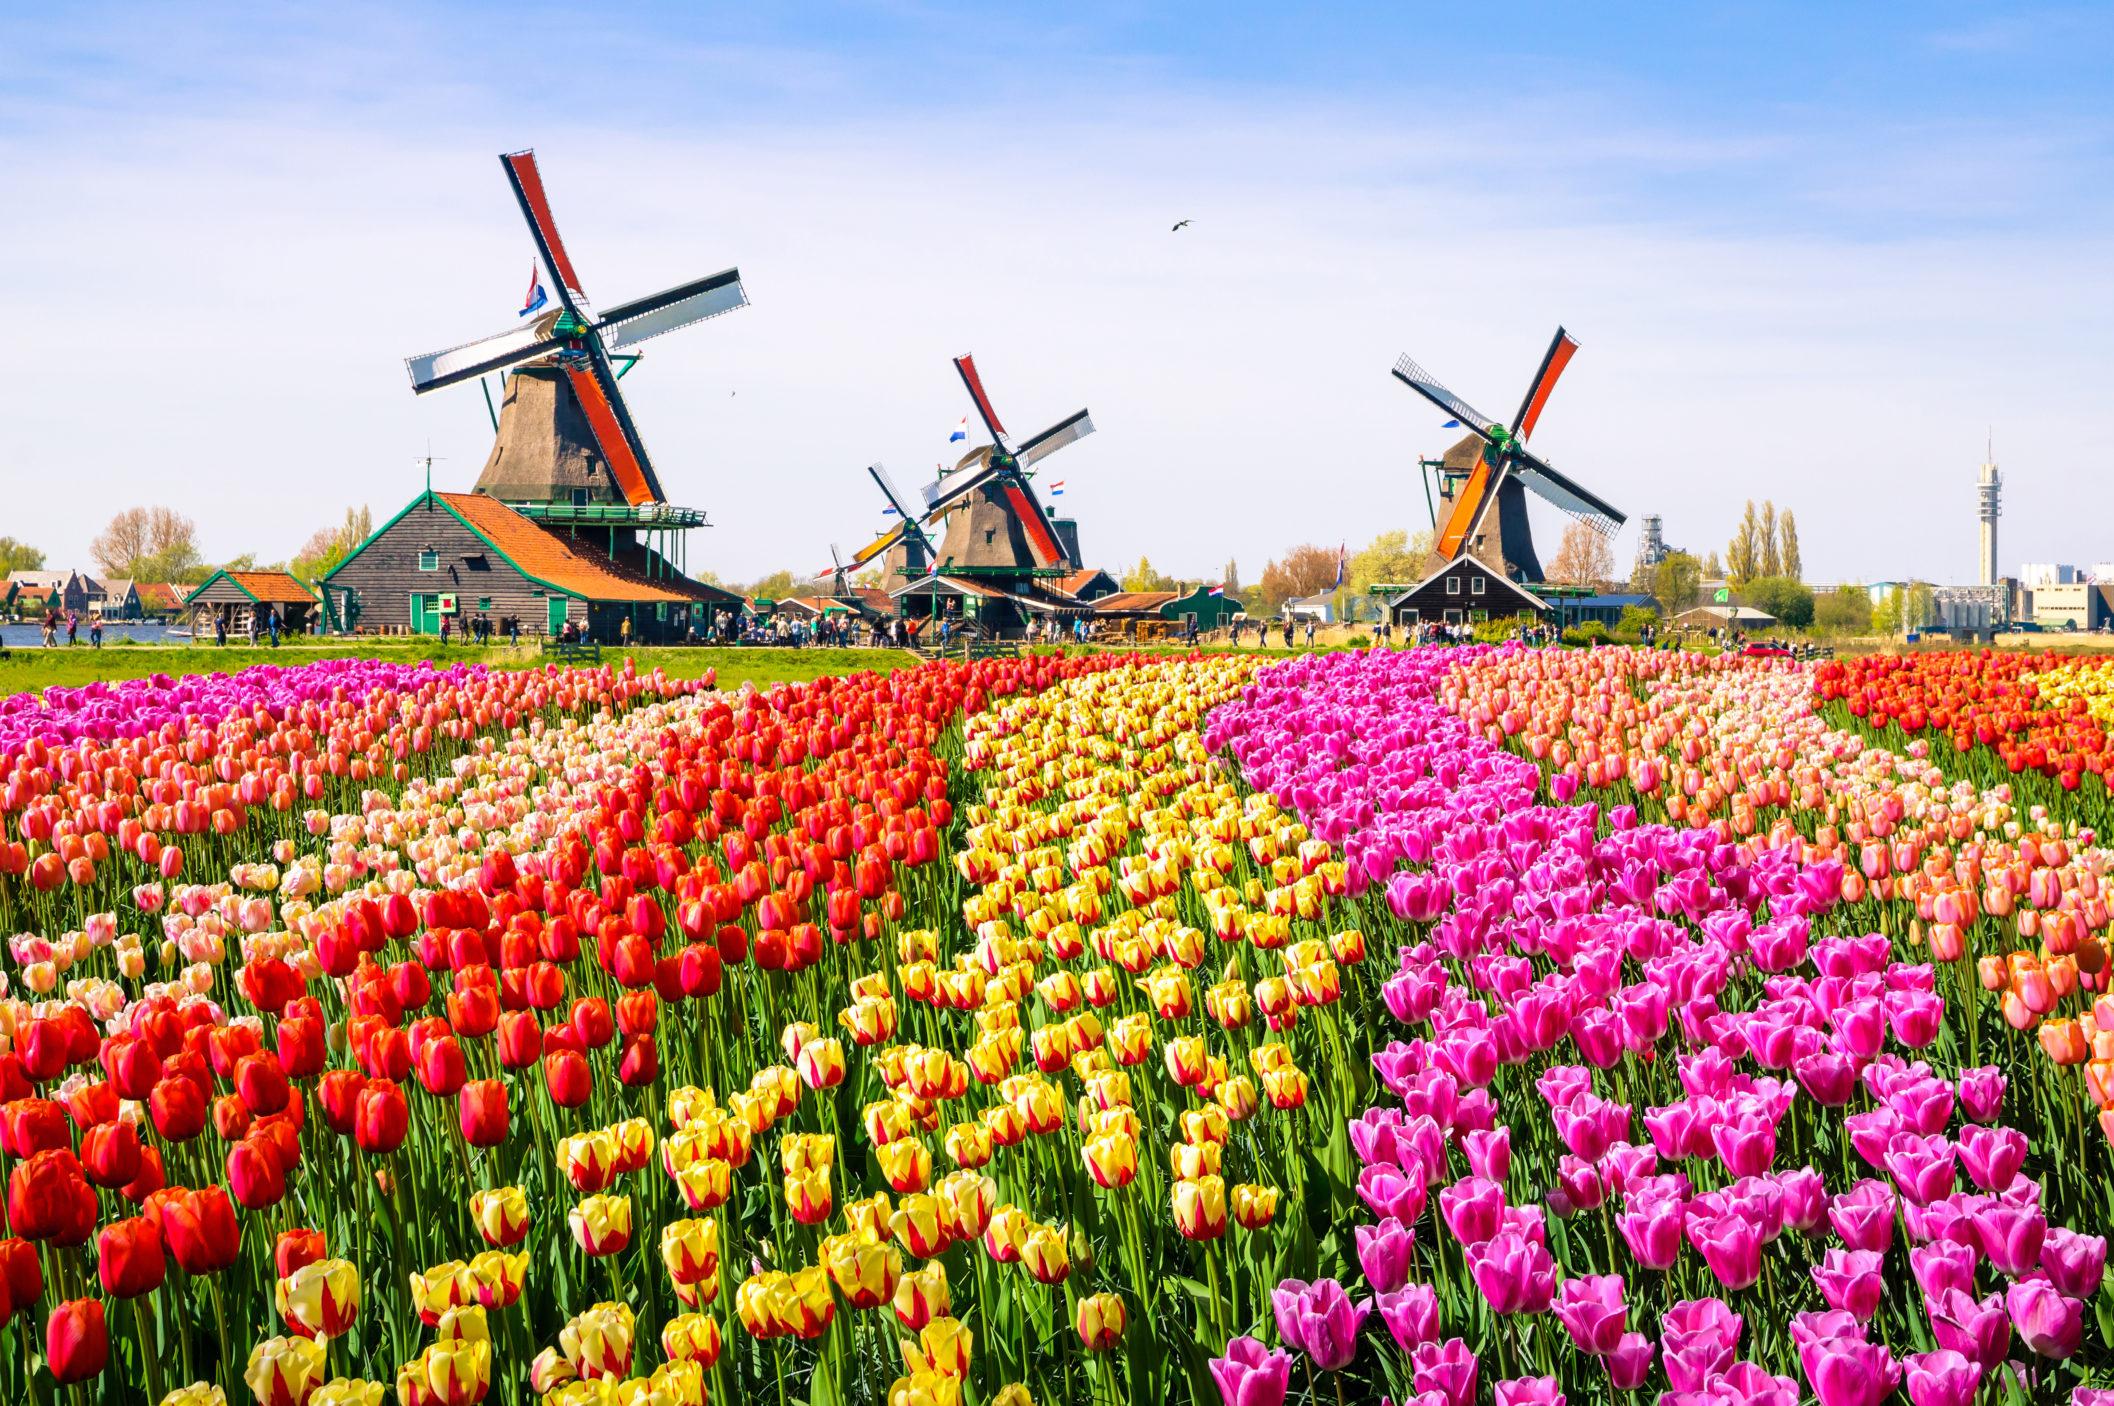 Netherlands [Shutterstock]